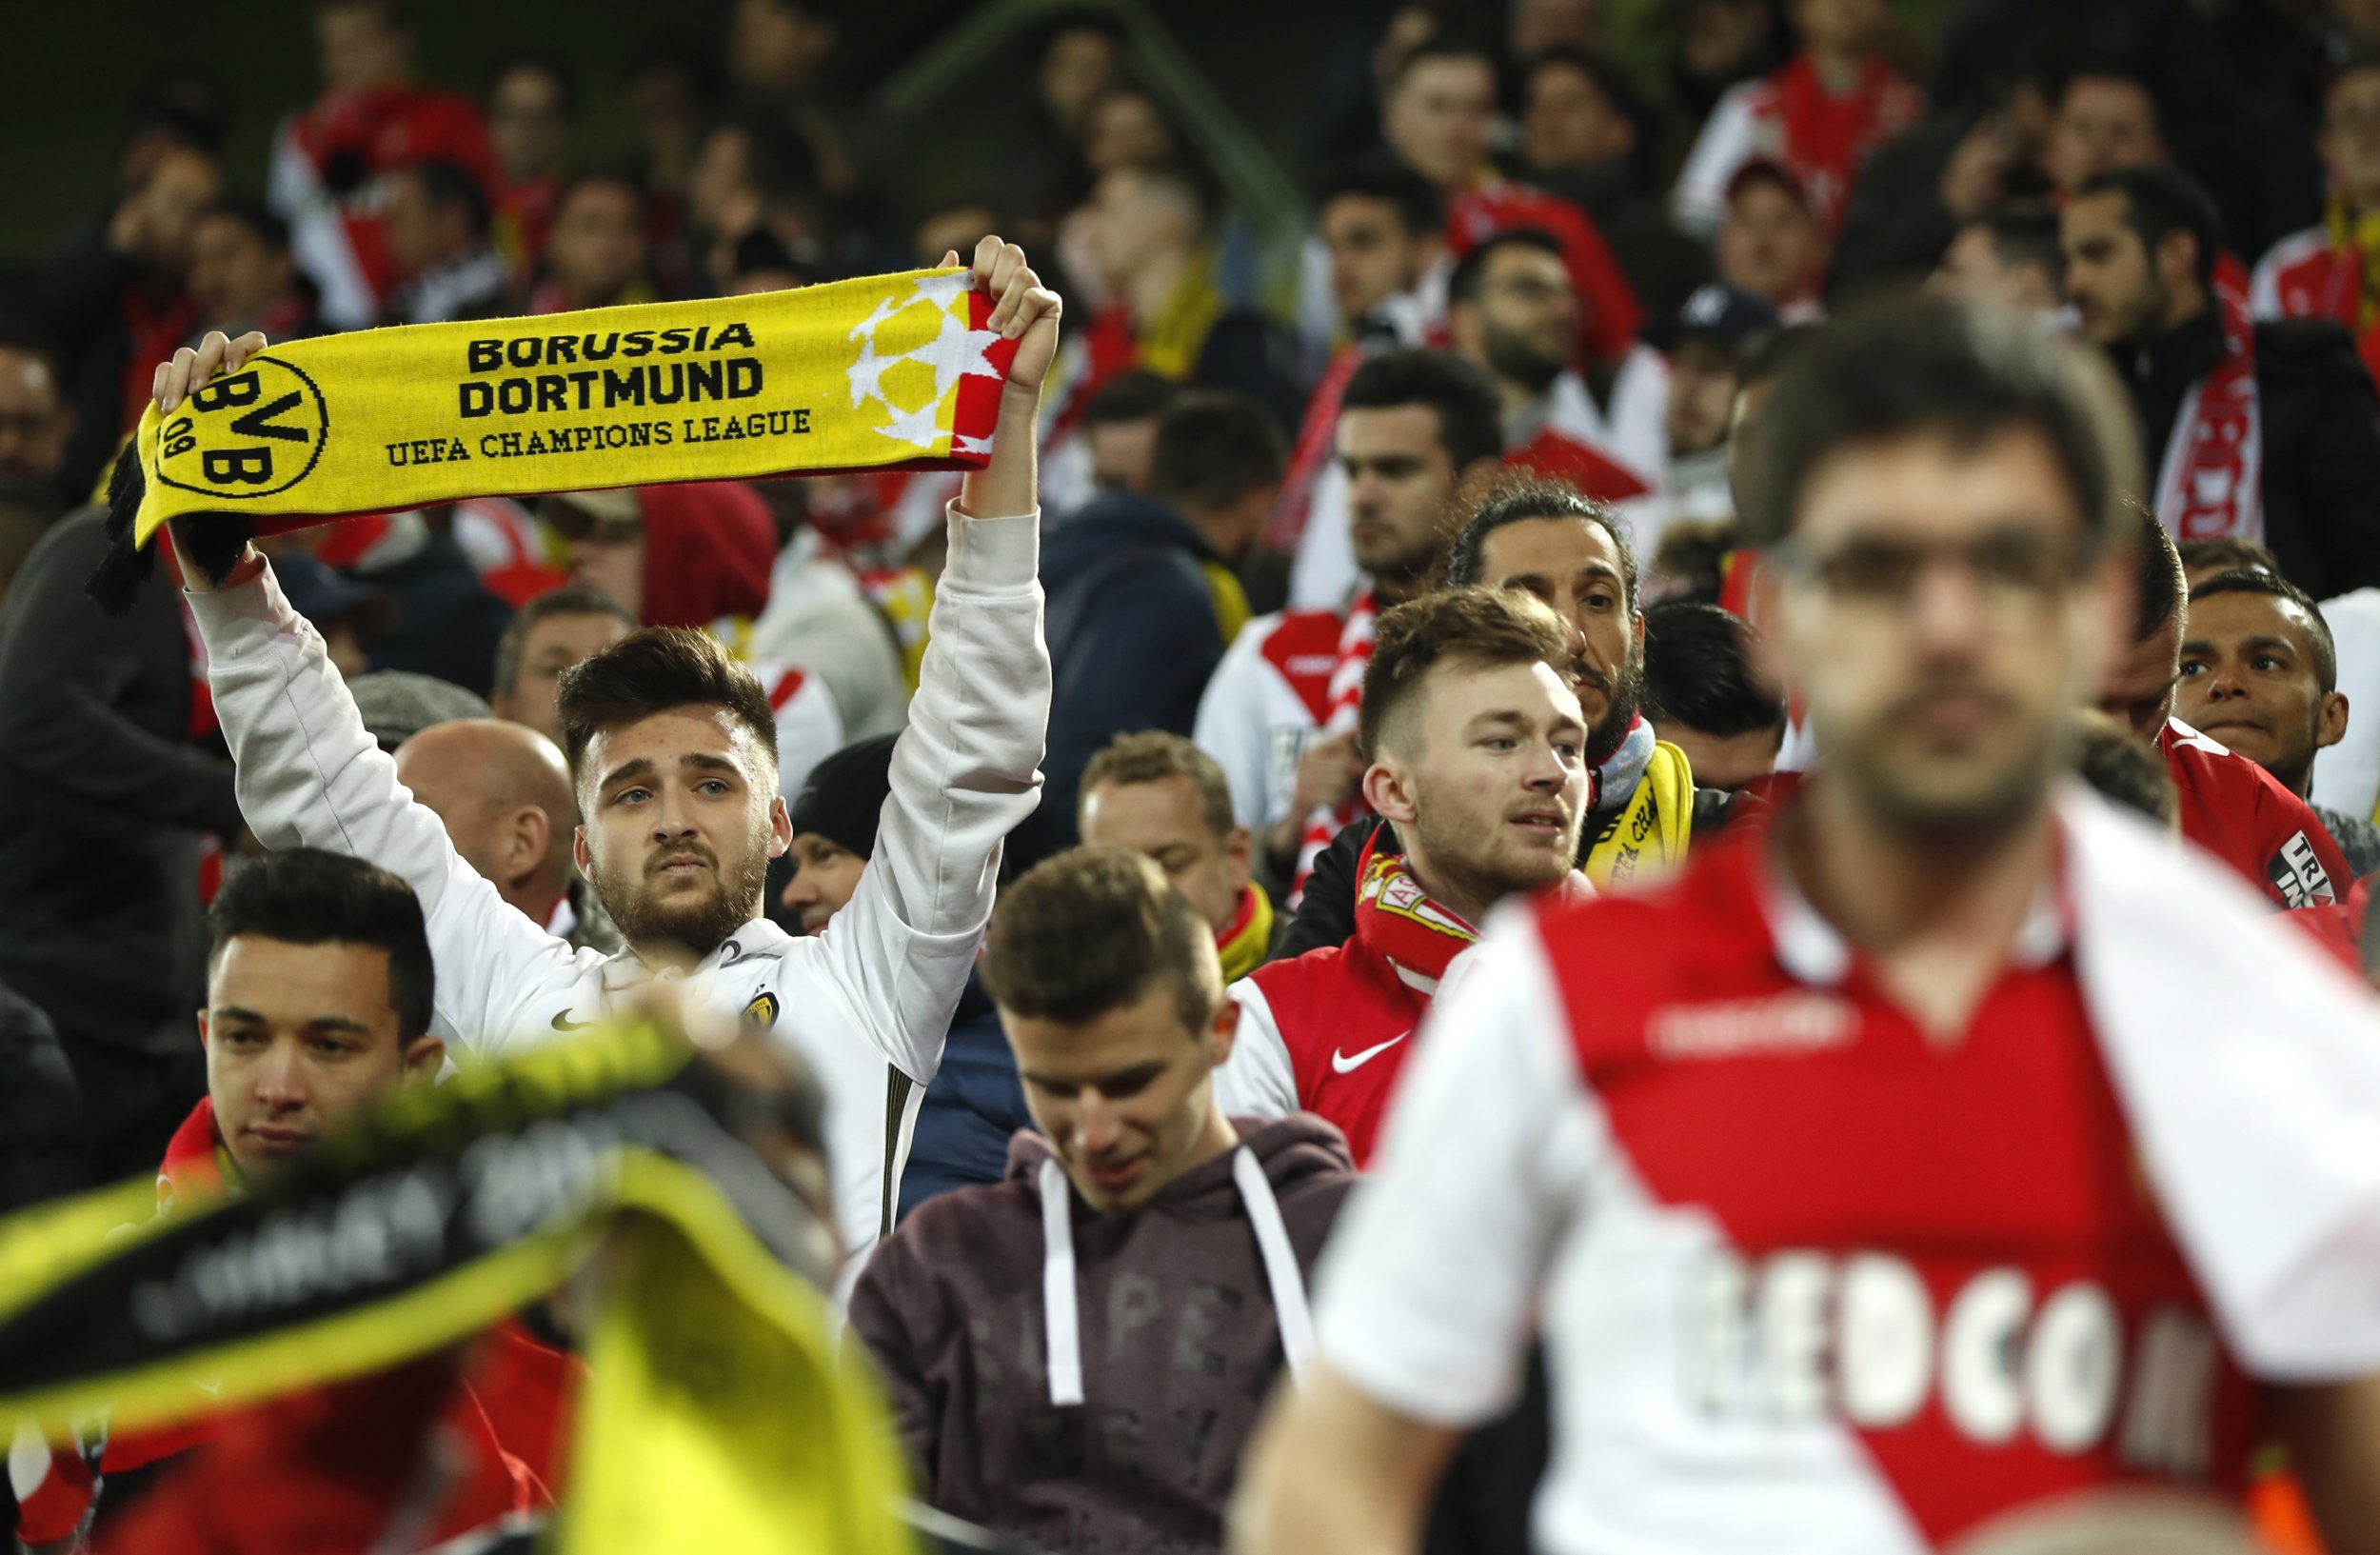 Monaco fans in Dortmund